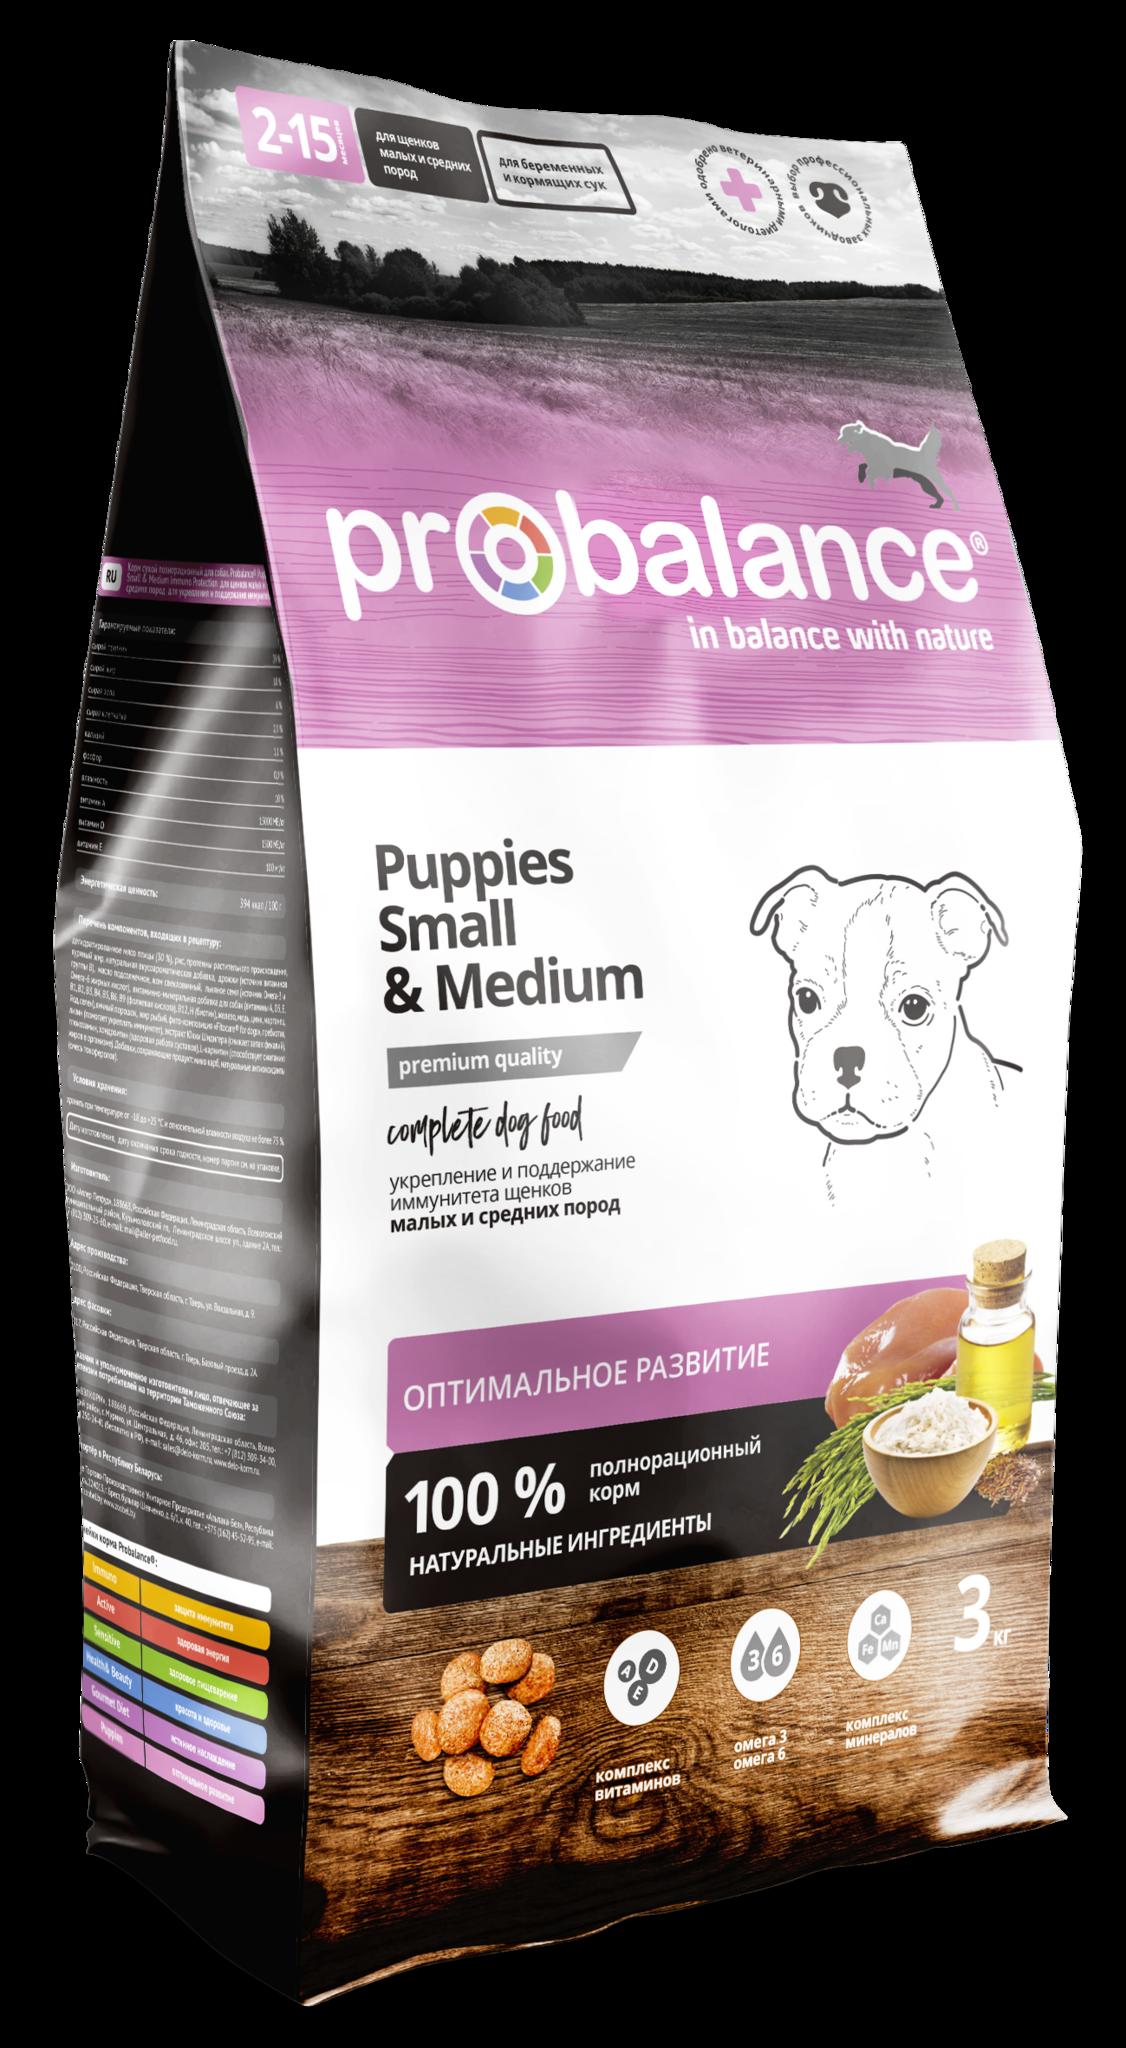 Сухой корм Корм ProBalance Immuno Puppies small and medium для щенков мелких и средних пород 3_PB_puppies_S_M.png